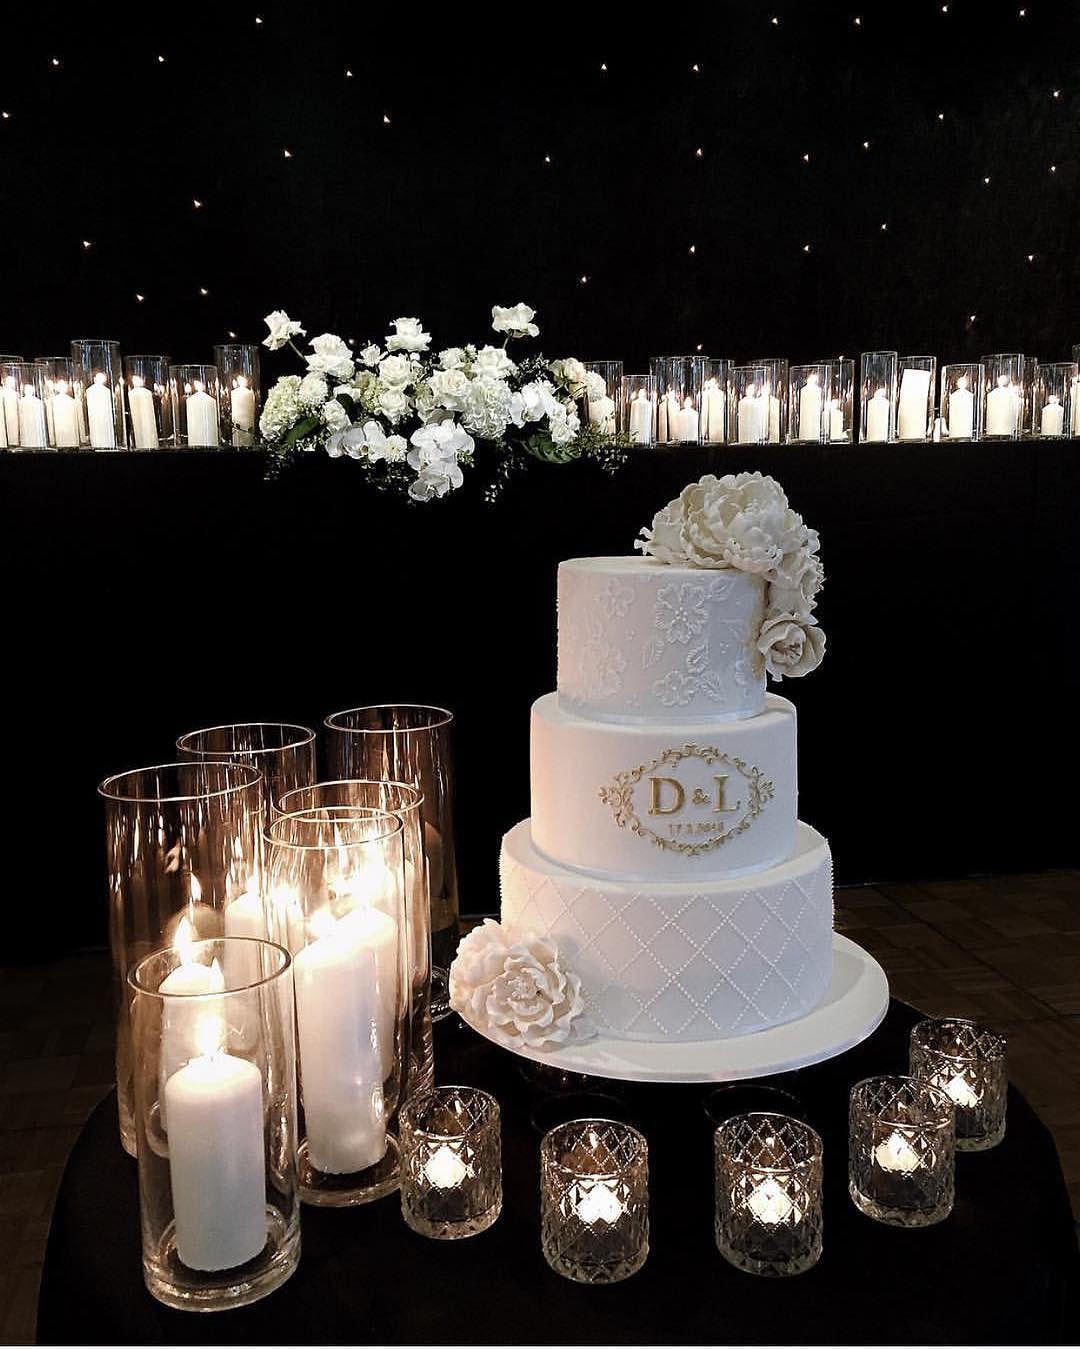 pastel de boda 2019